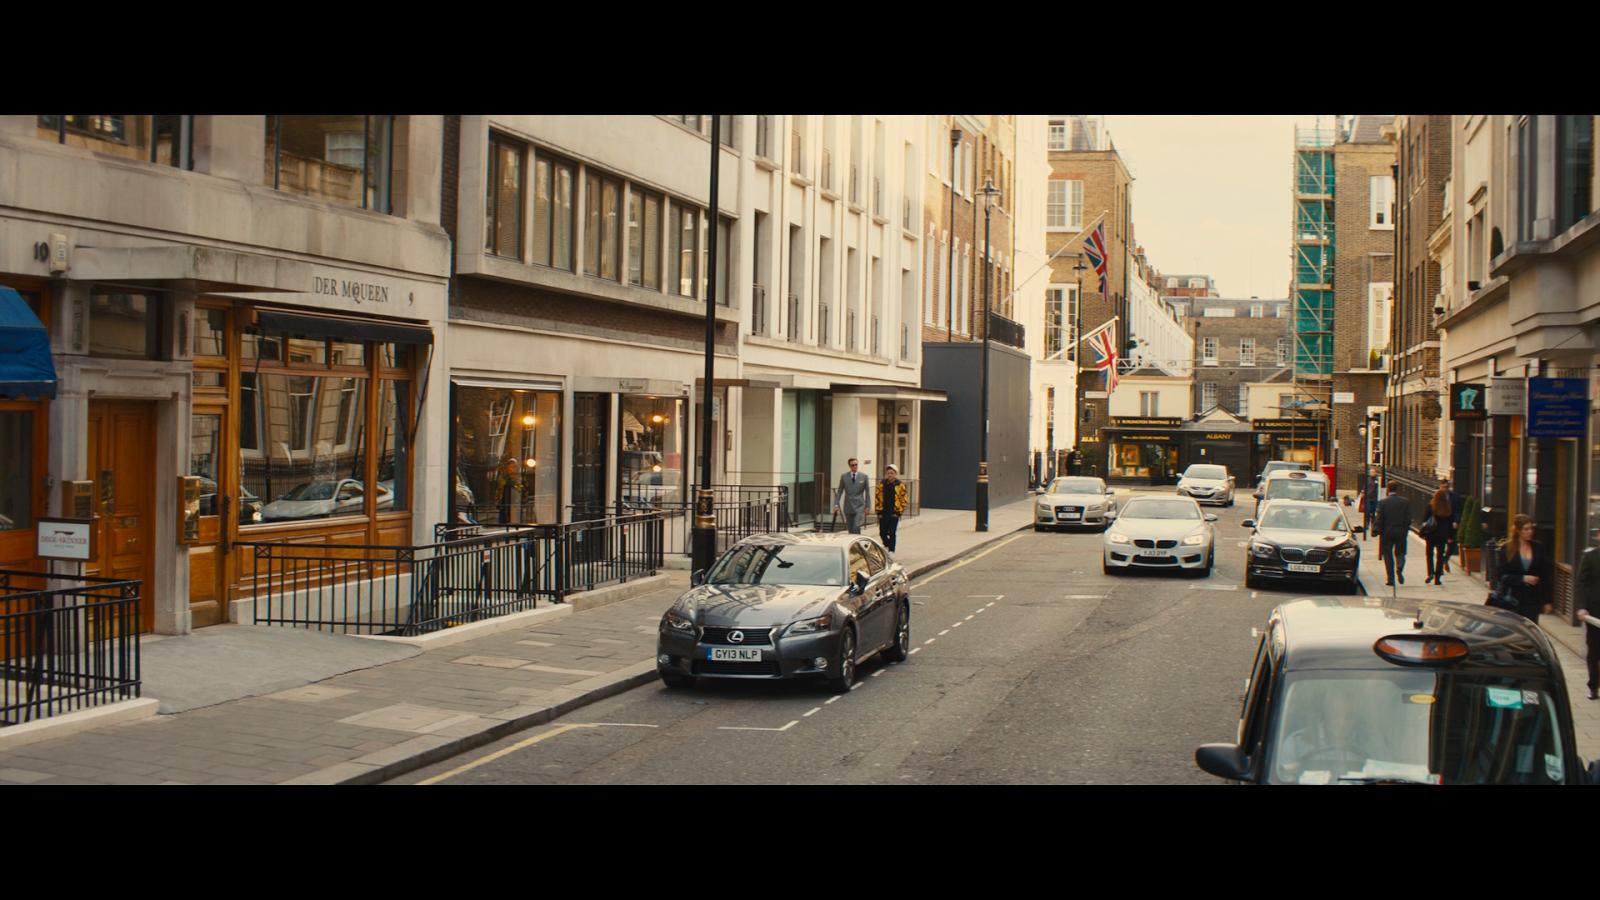 Kingsman El Servicio Secreto (2015) 1080p BD25 1